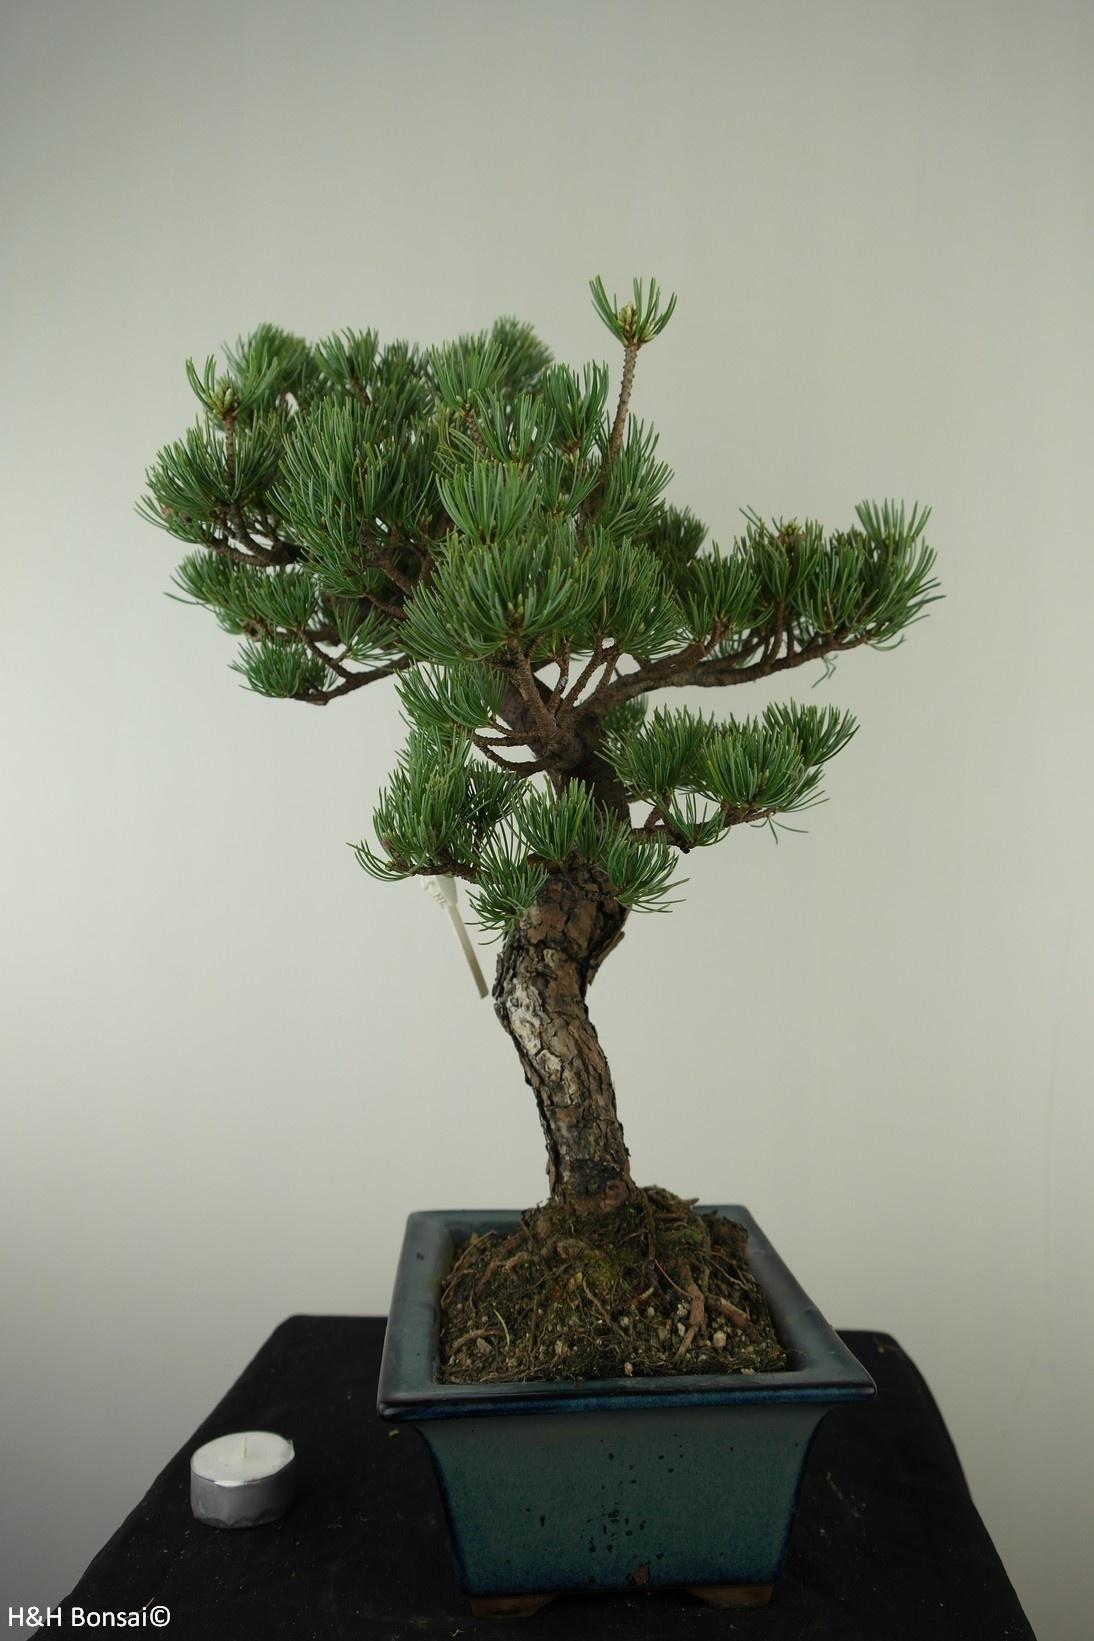 Bonsai Pinus pentaphylla, Japanse witte den, nr. 7809